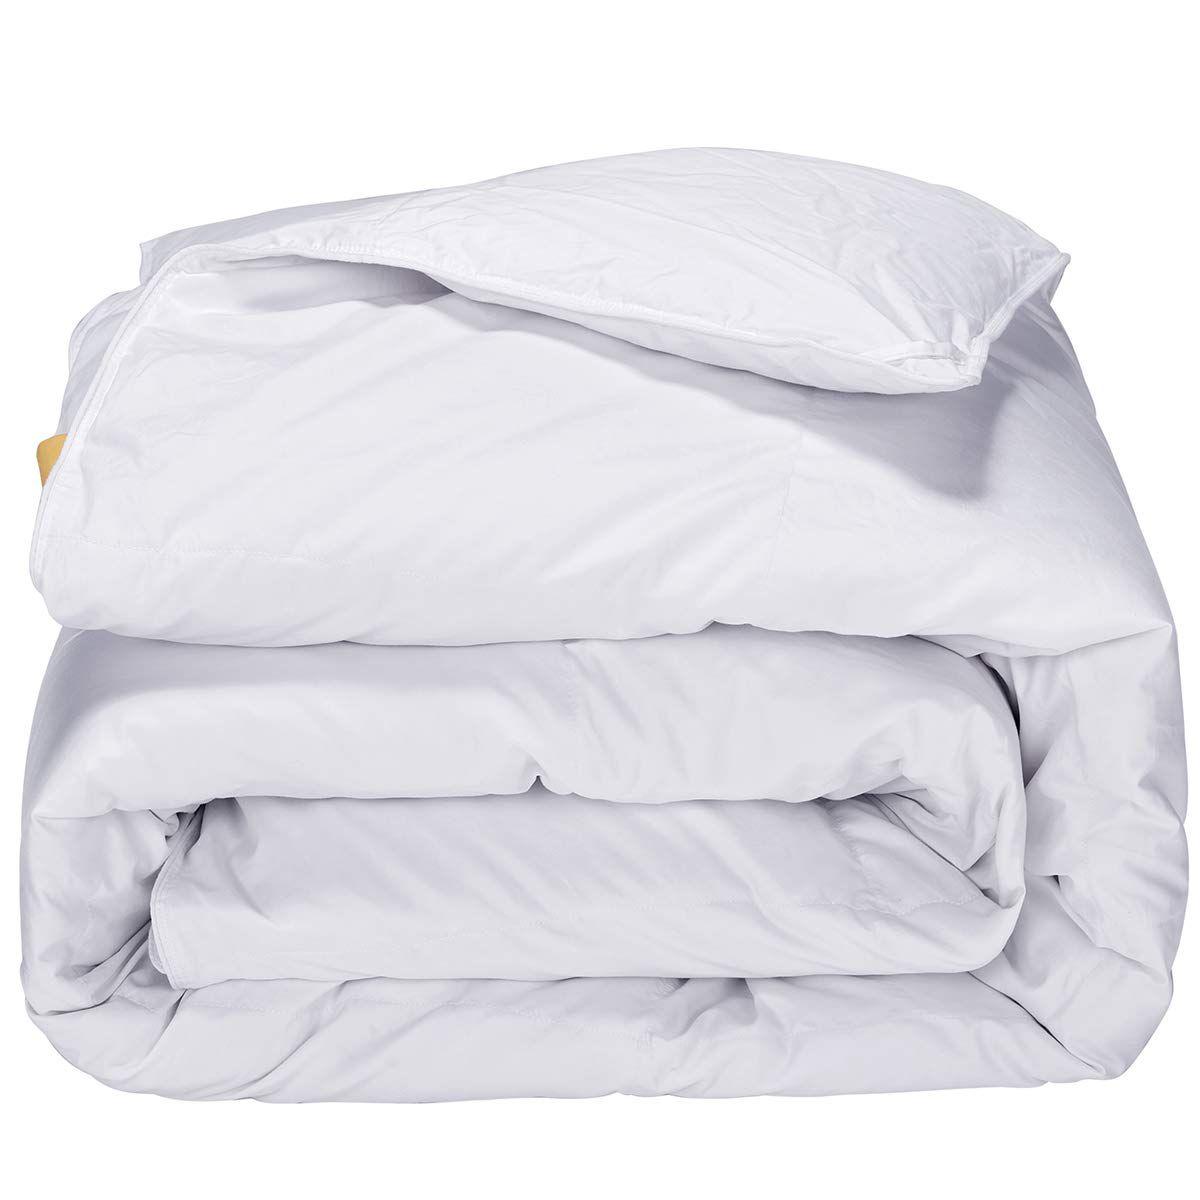 Puredown down comforter